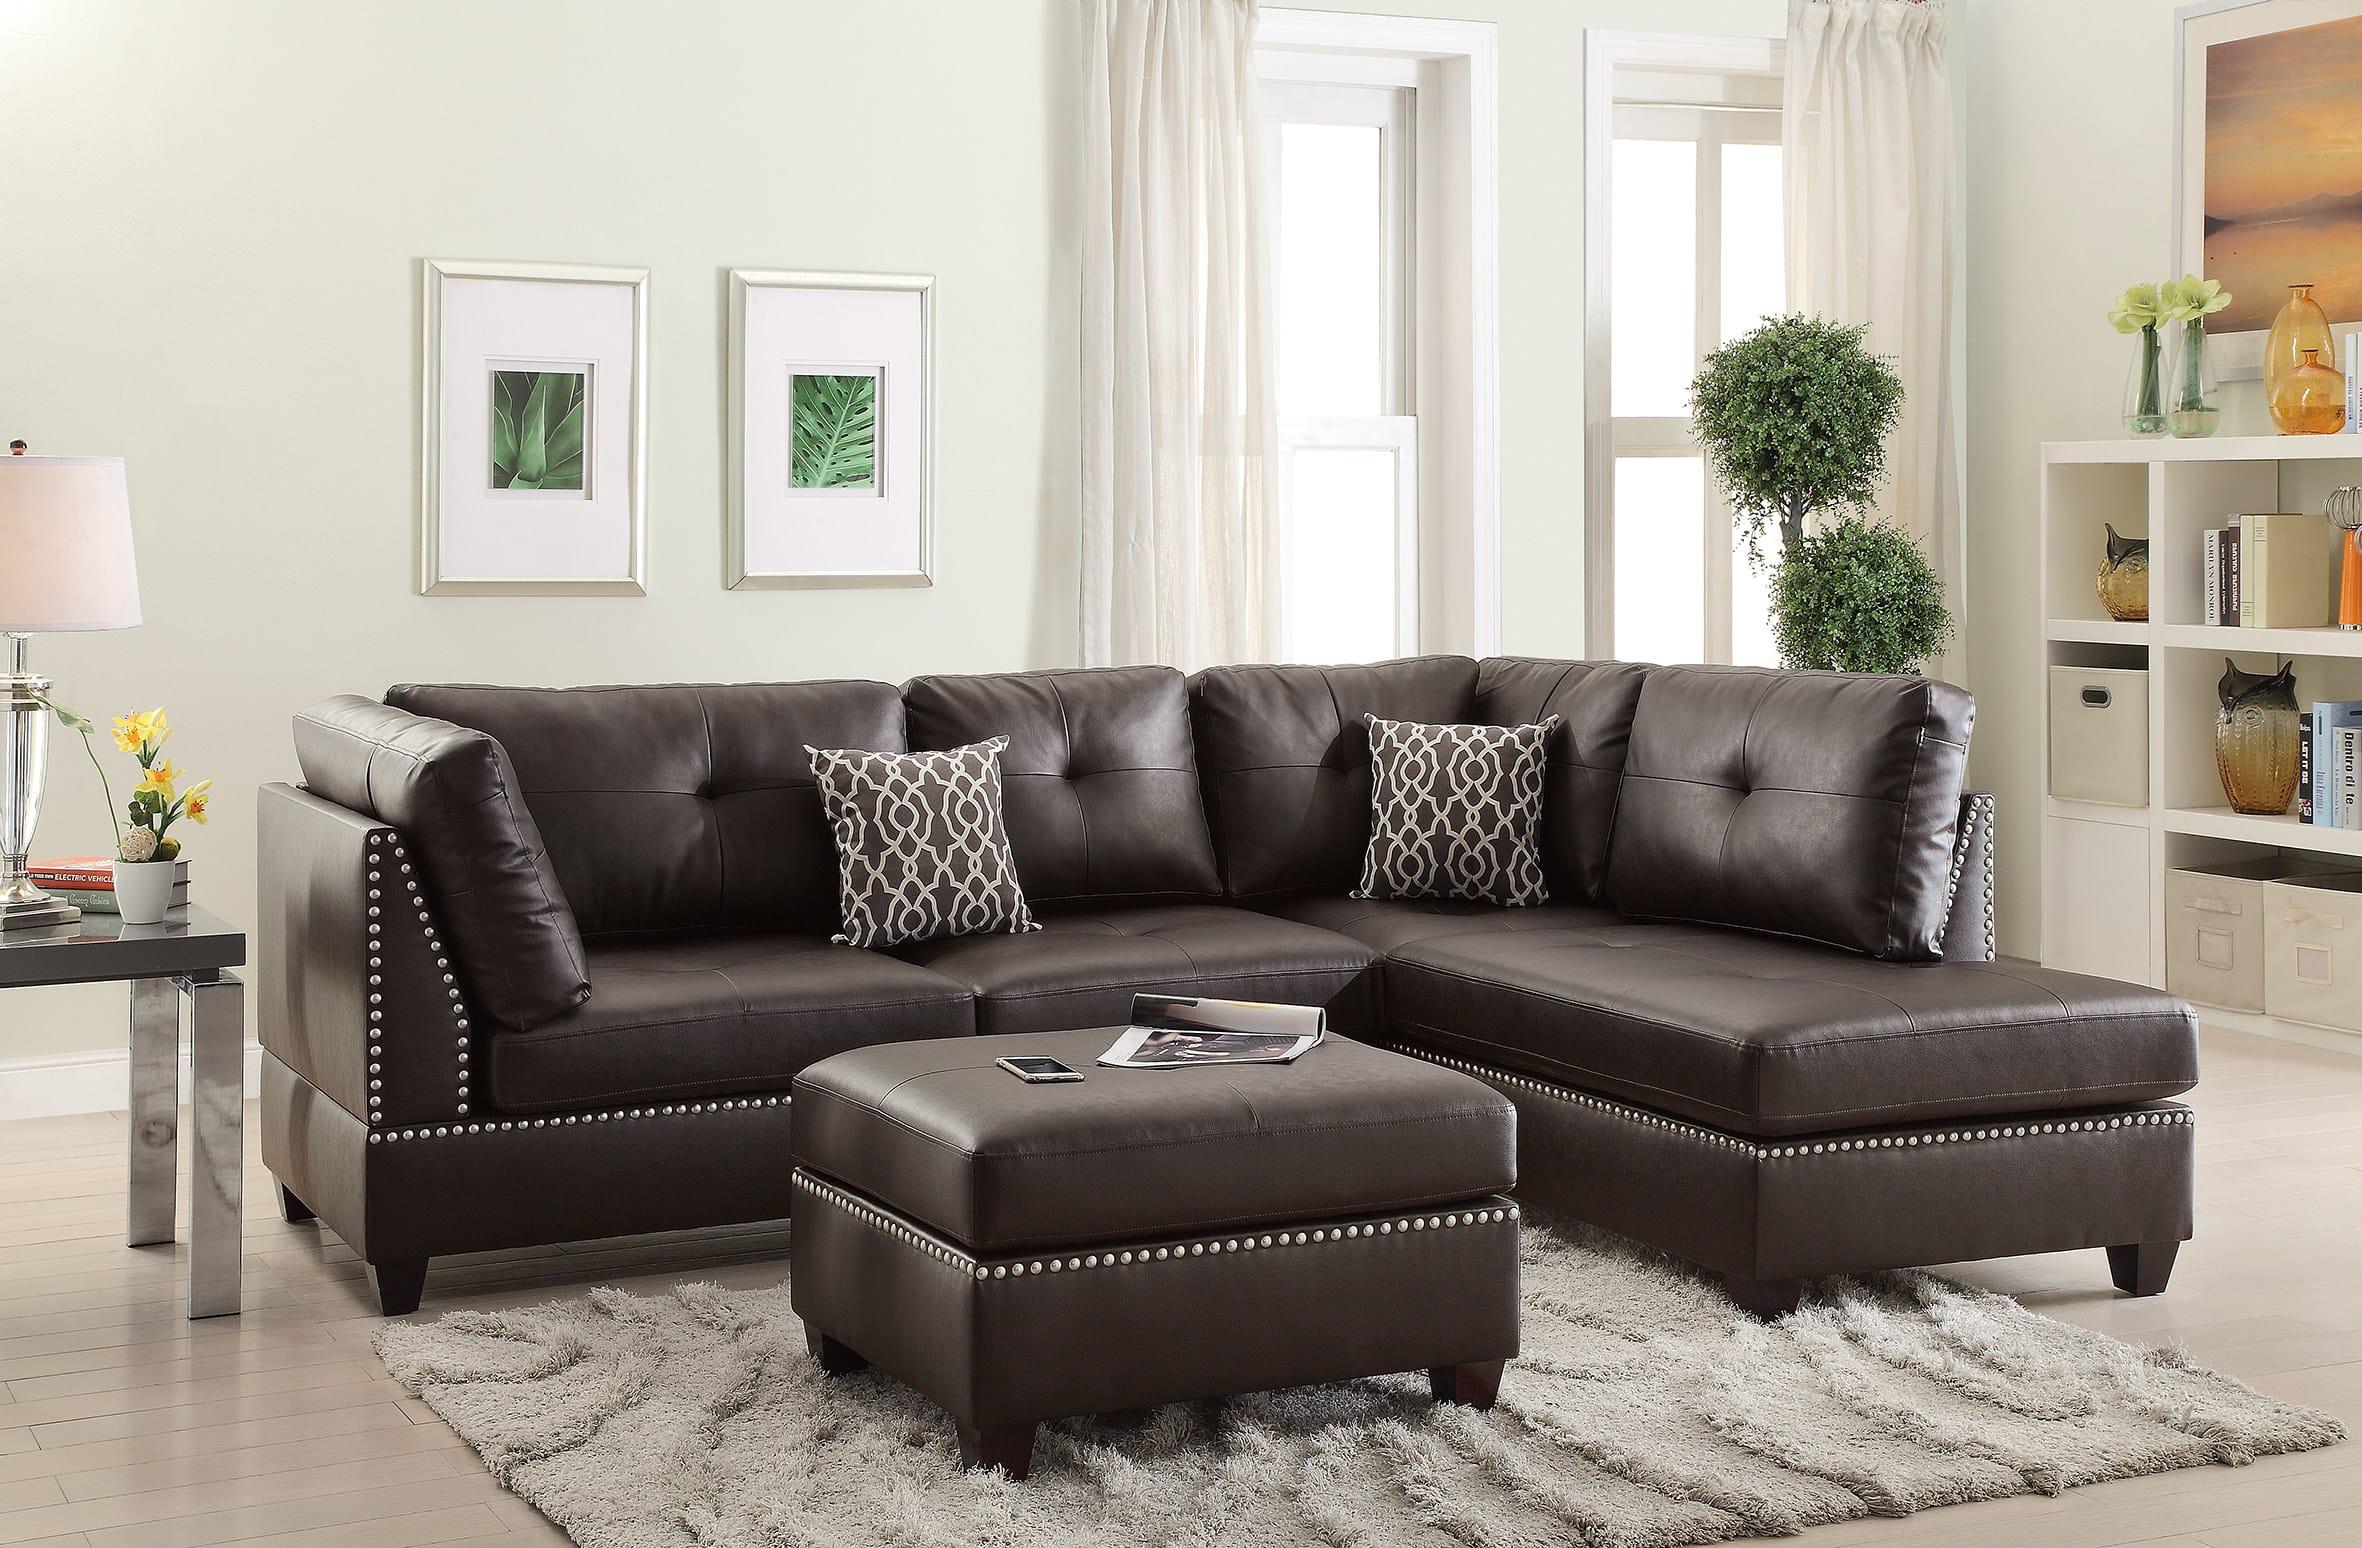 F6973 Espresso 3 Pcs Sectional Sofa Set by Poundex